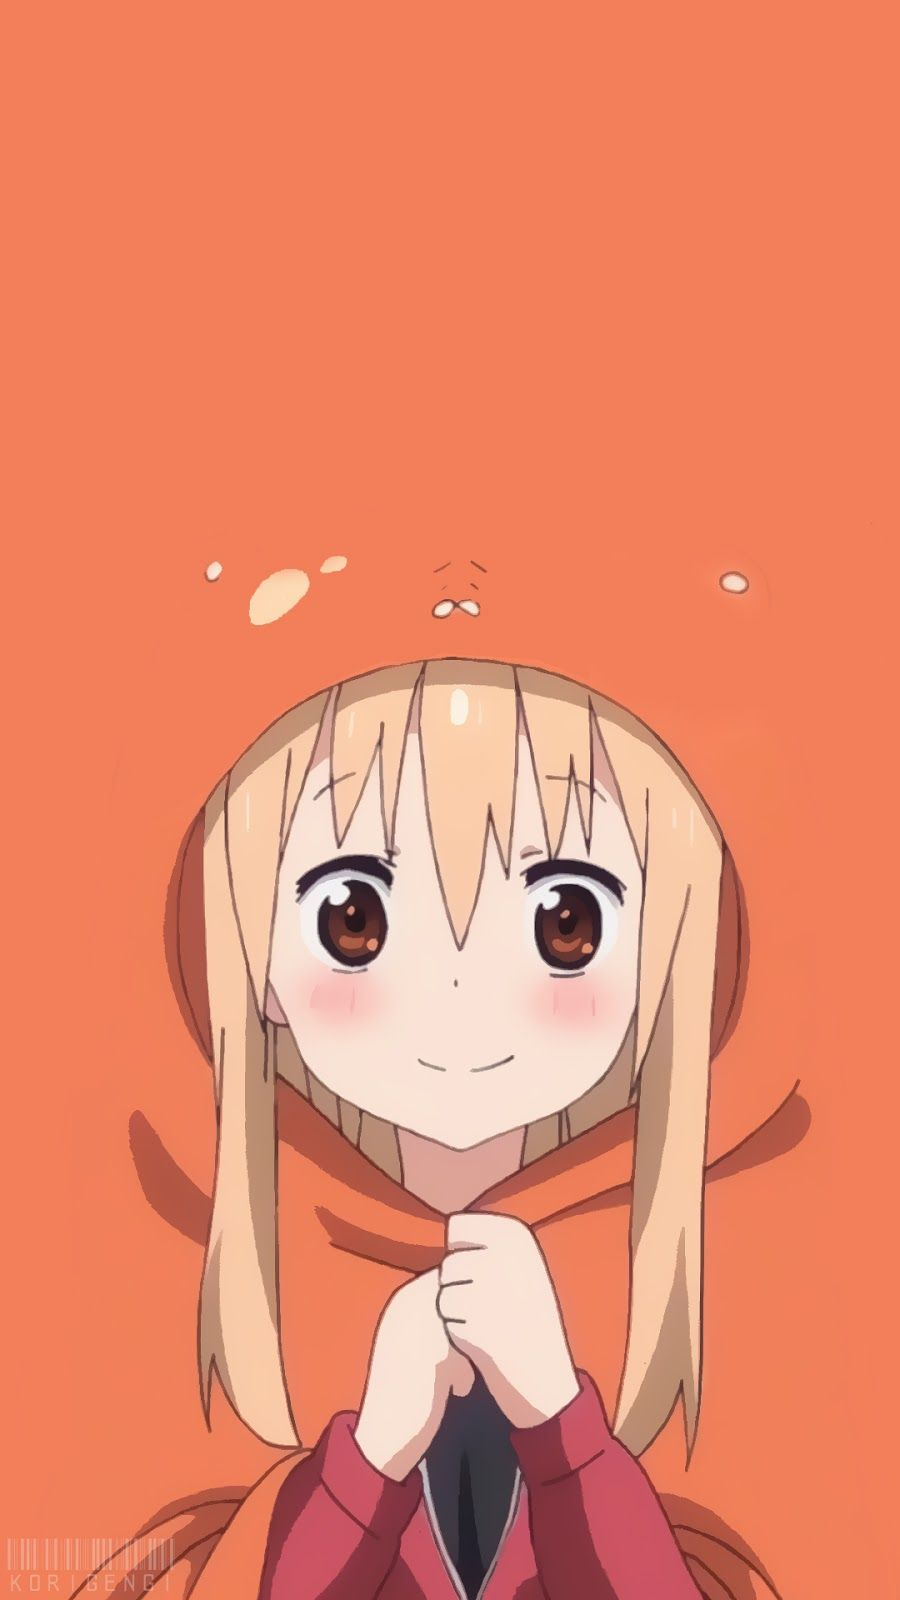 Umaru Doma V Beautiful Anime Girl Yandere Himouto Umaru Chan Anime Lock Screen